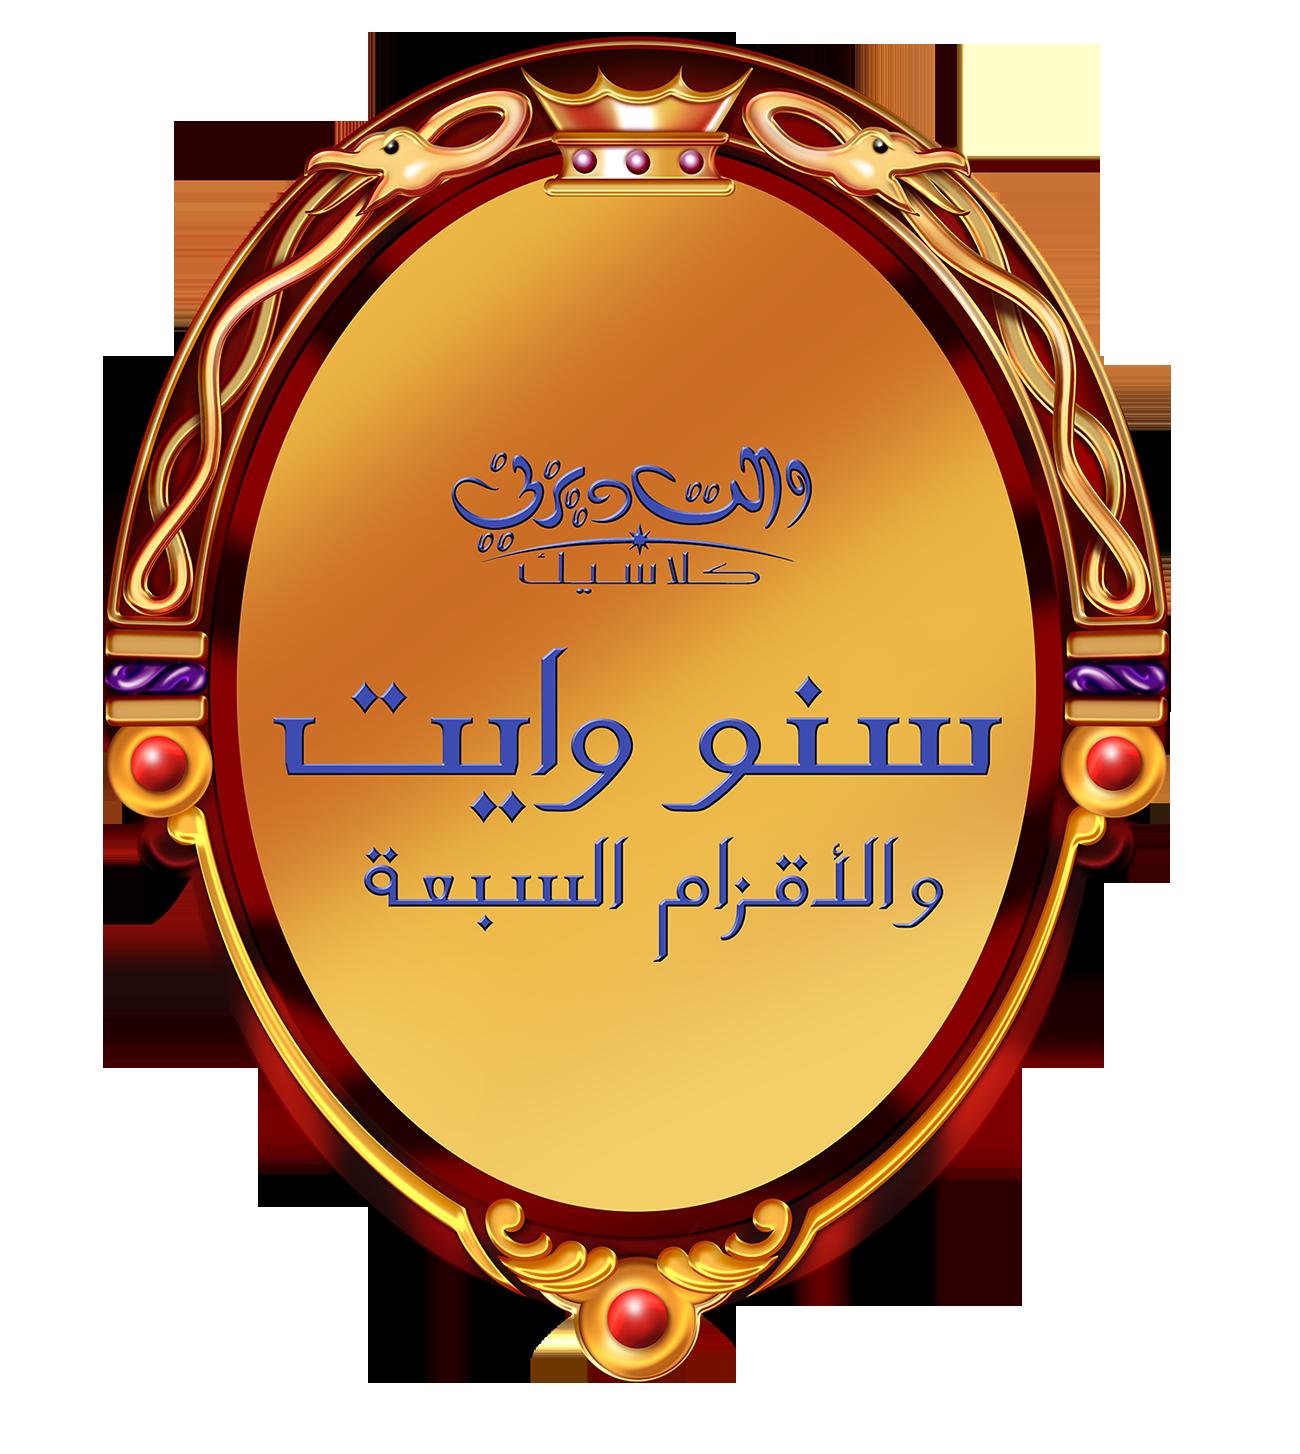 snow white and the seven dwarfs logo شعار سنووايت والأقزام